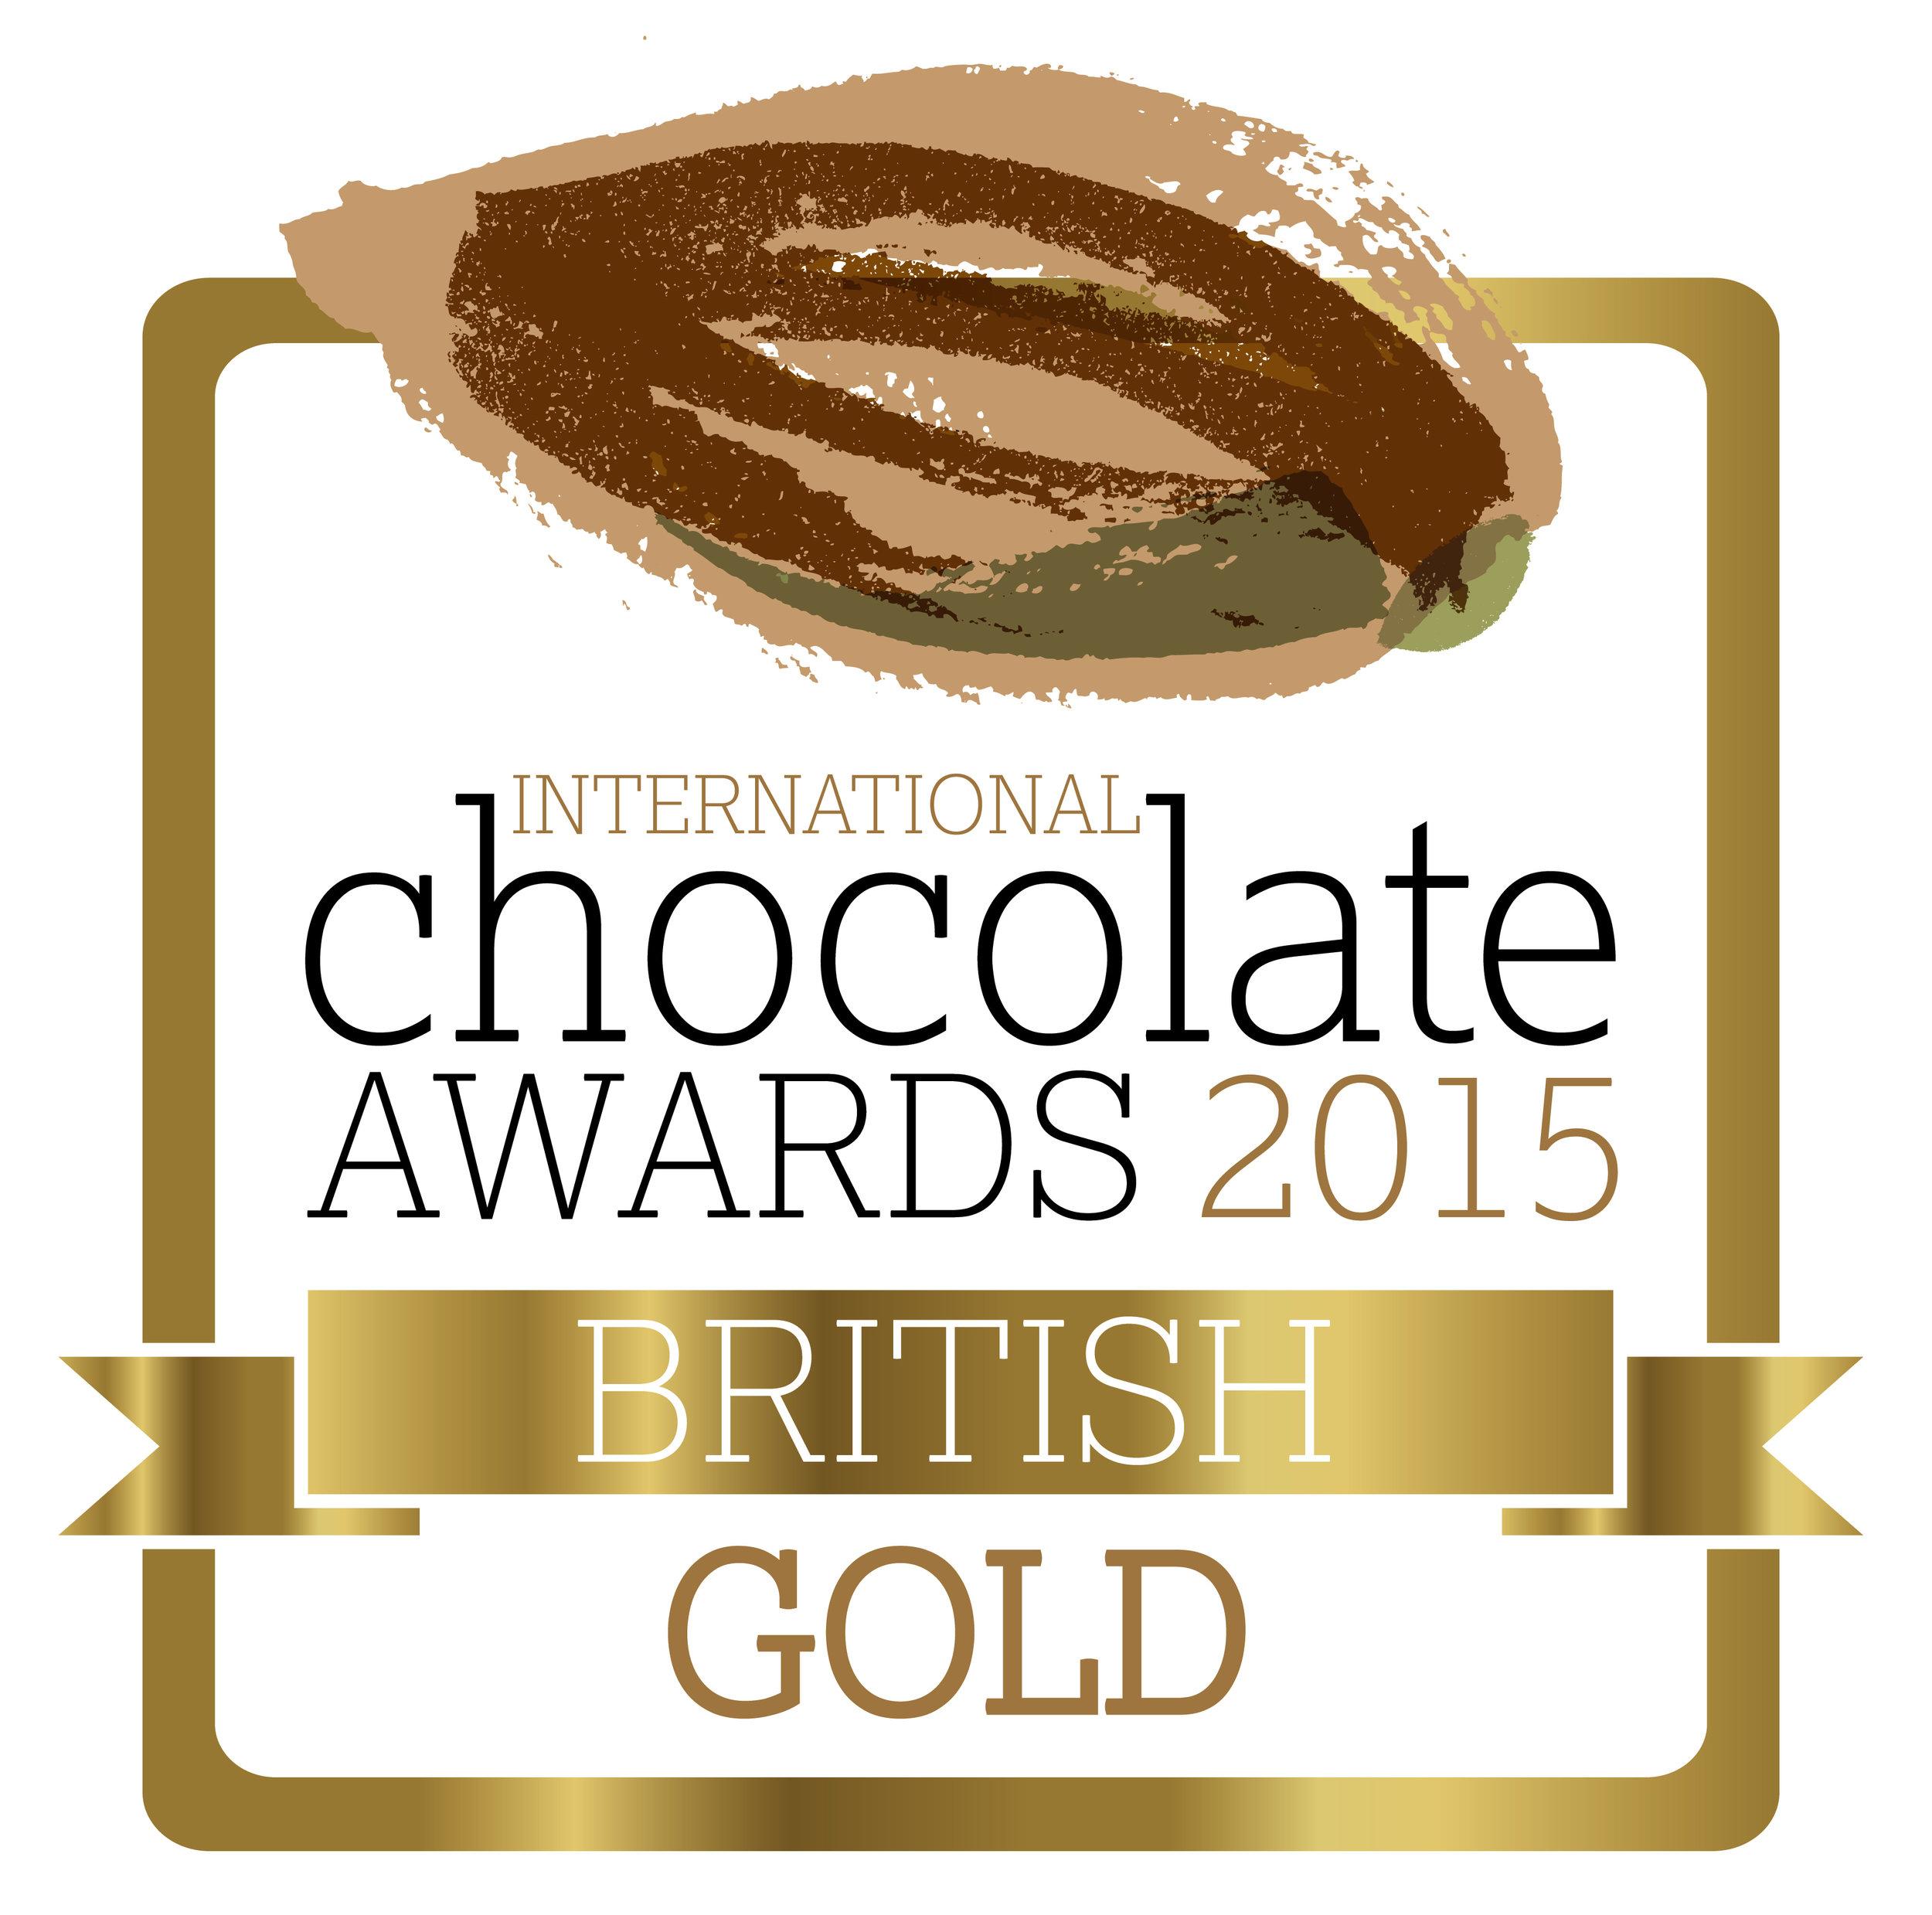 International Chocolate Awards 2015 - Gold - British RGB.jpg